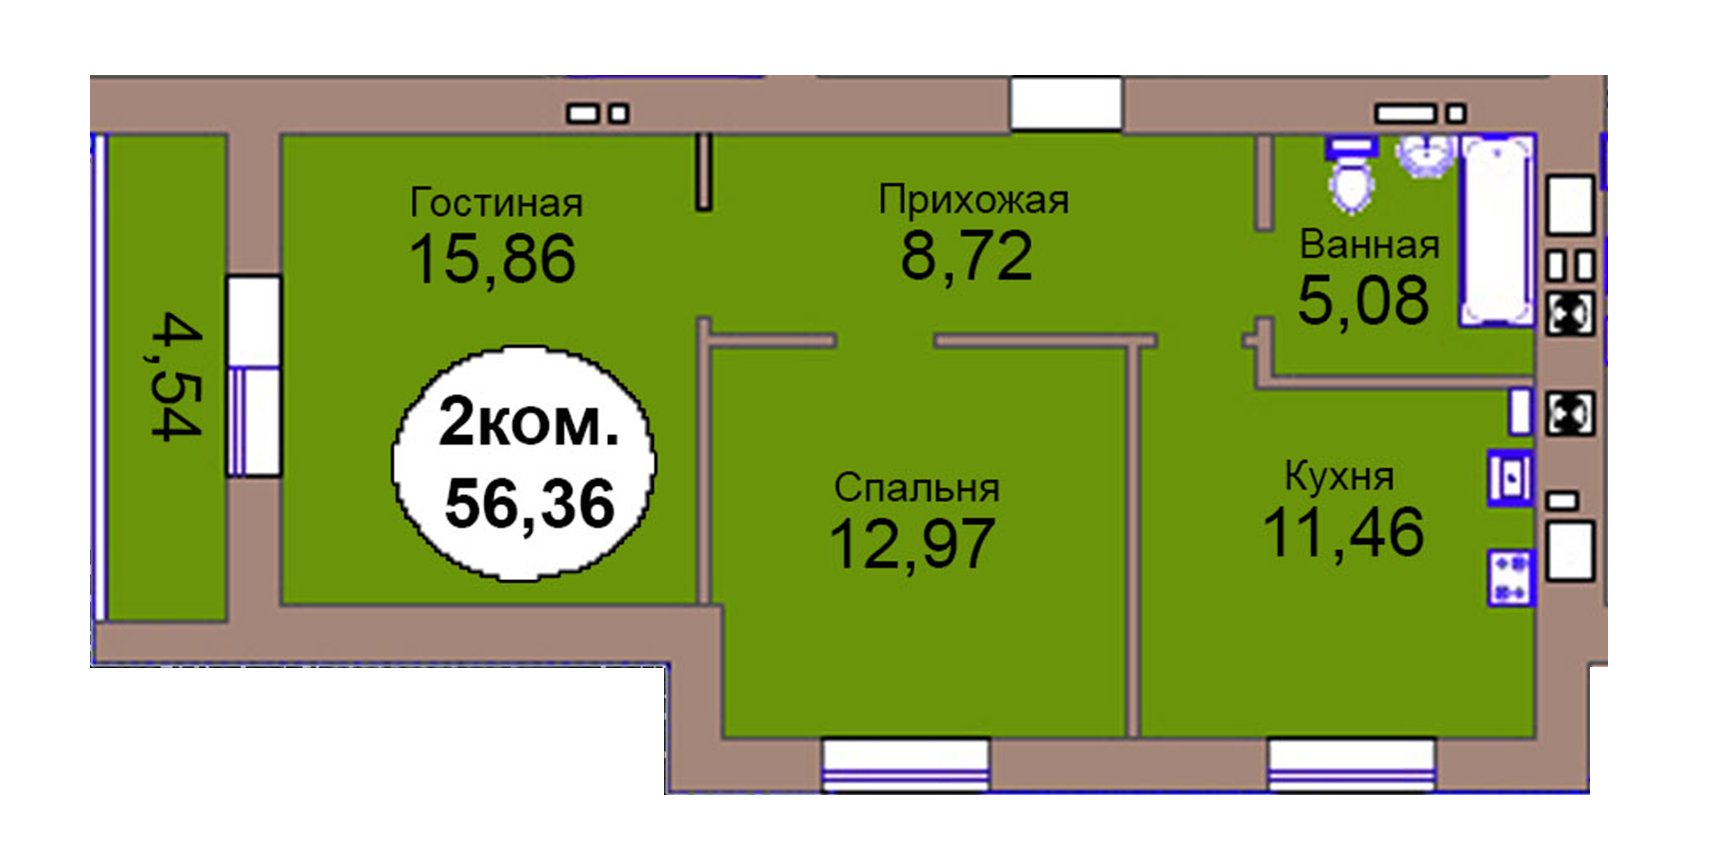 2-комн. кв. по пер. Калининградский, 4  кв. 98 в Калининграде